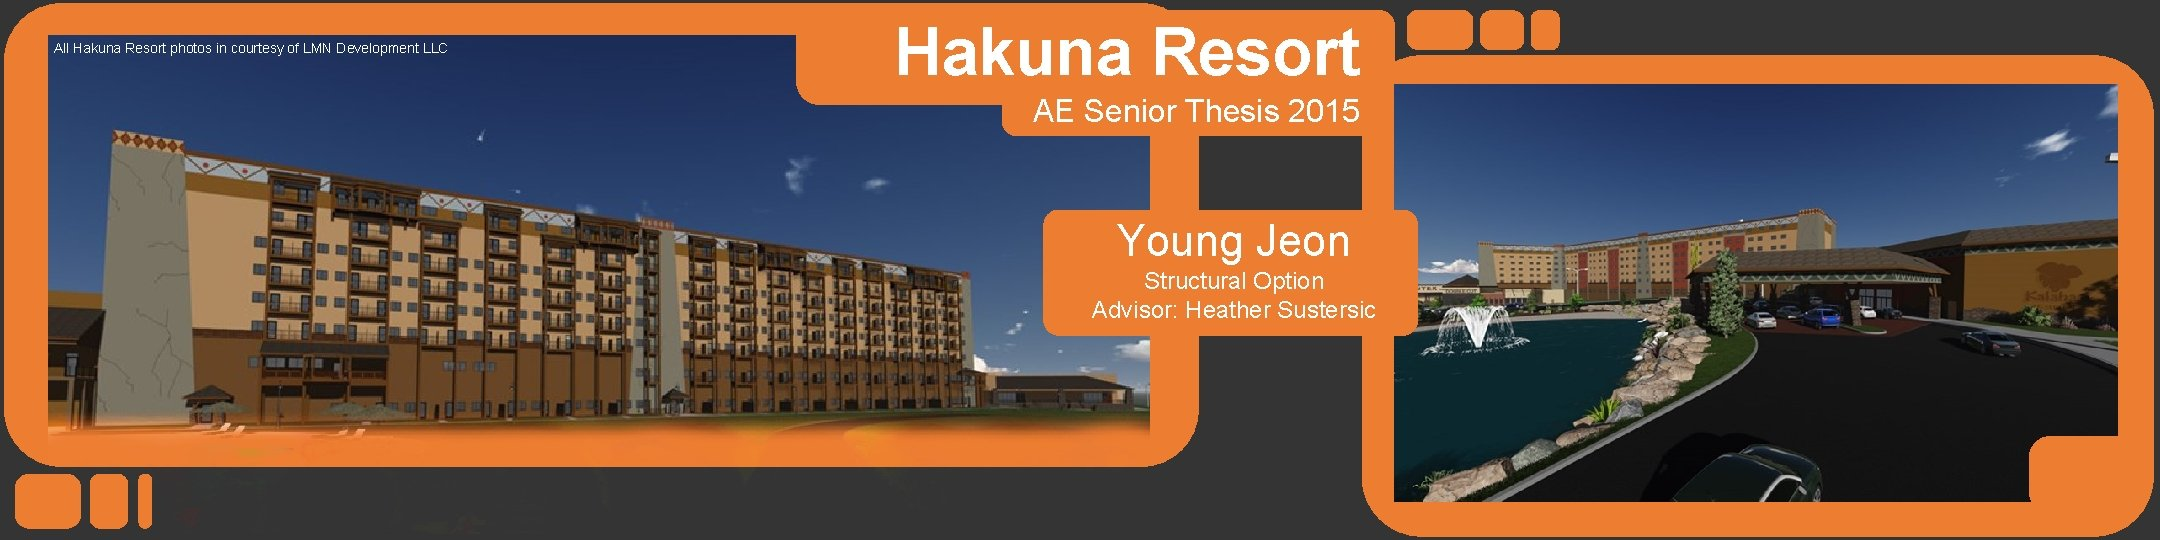 All Hakuna Resort photos in courtesy of LMN Development LLC Hakuna Resort AE Senior